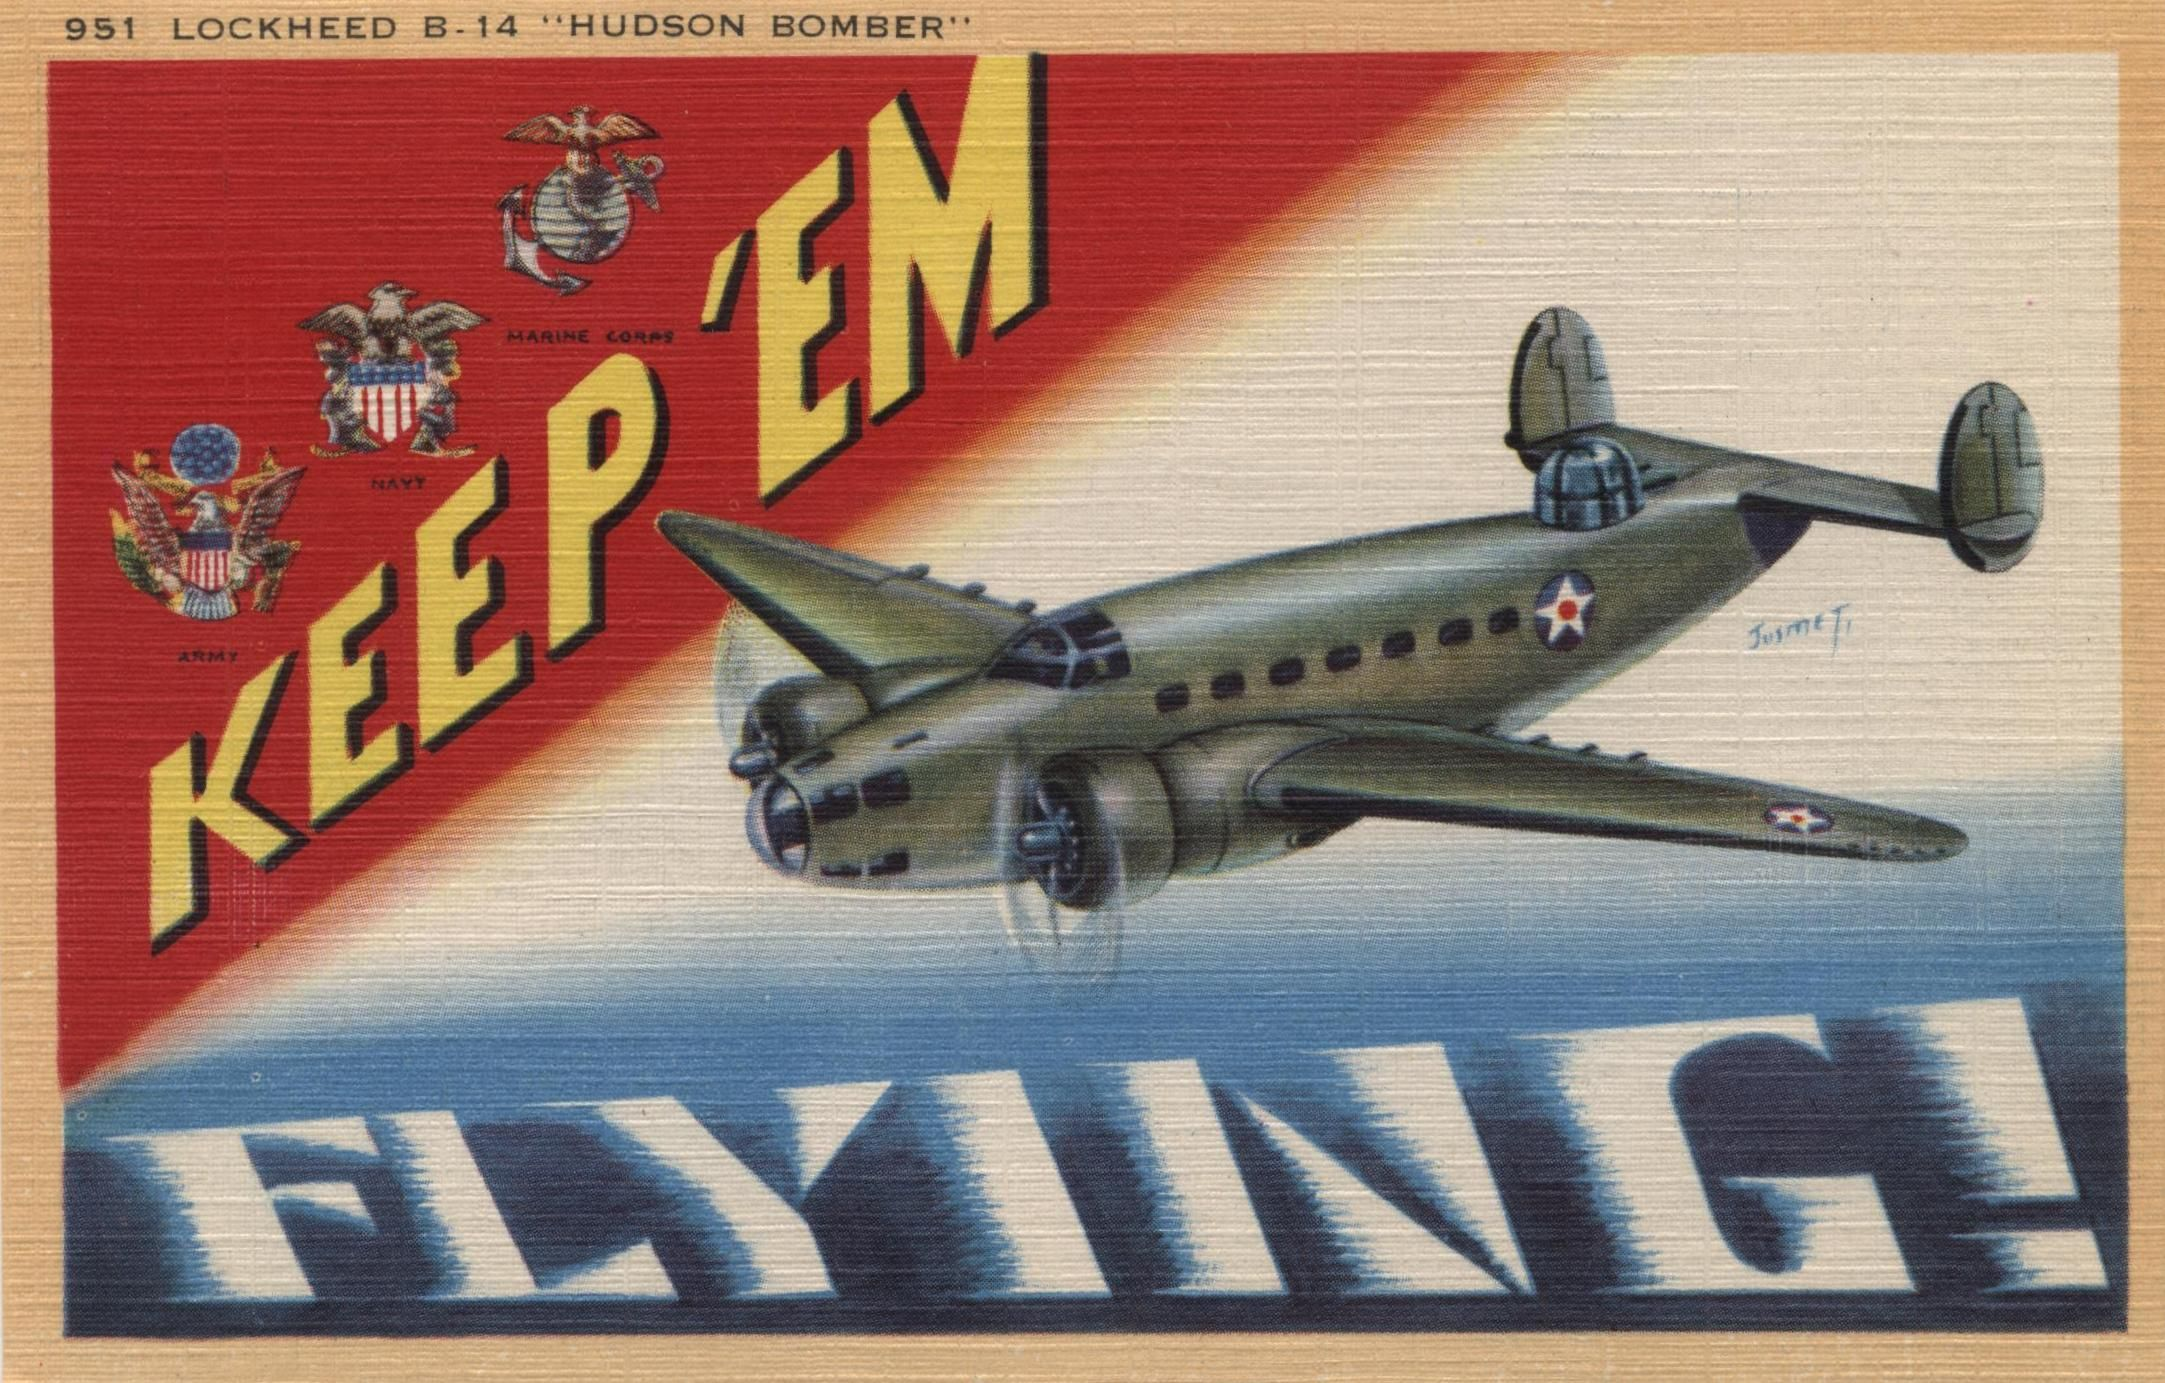 KEEP 'EM FLYING FIGHTER AIRCRAFT POST CARDS ORIGINALS